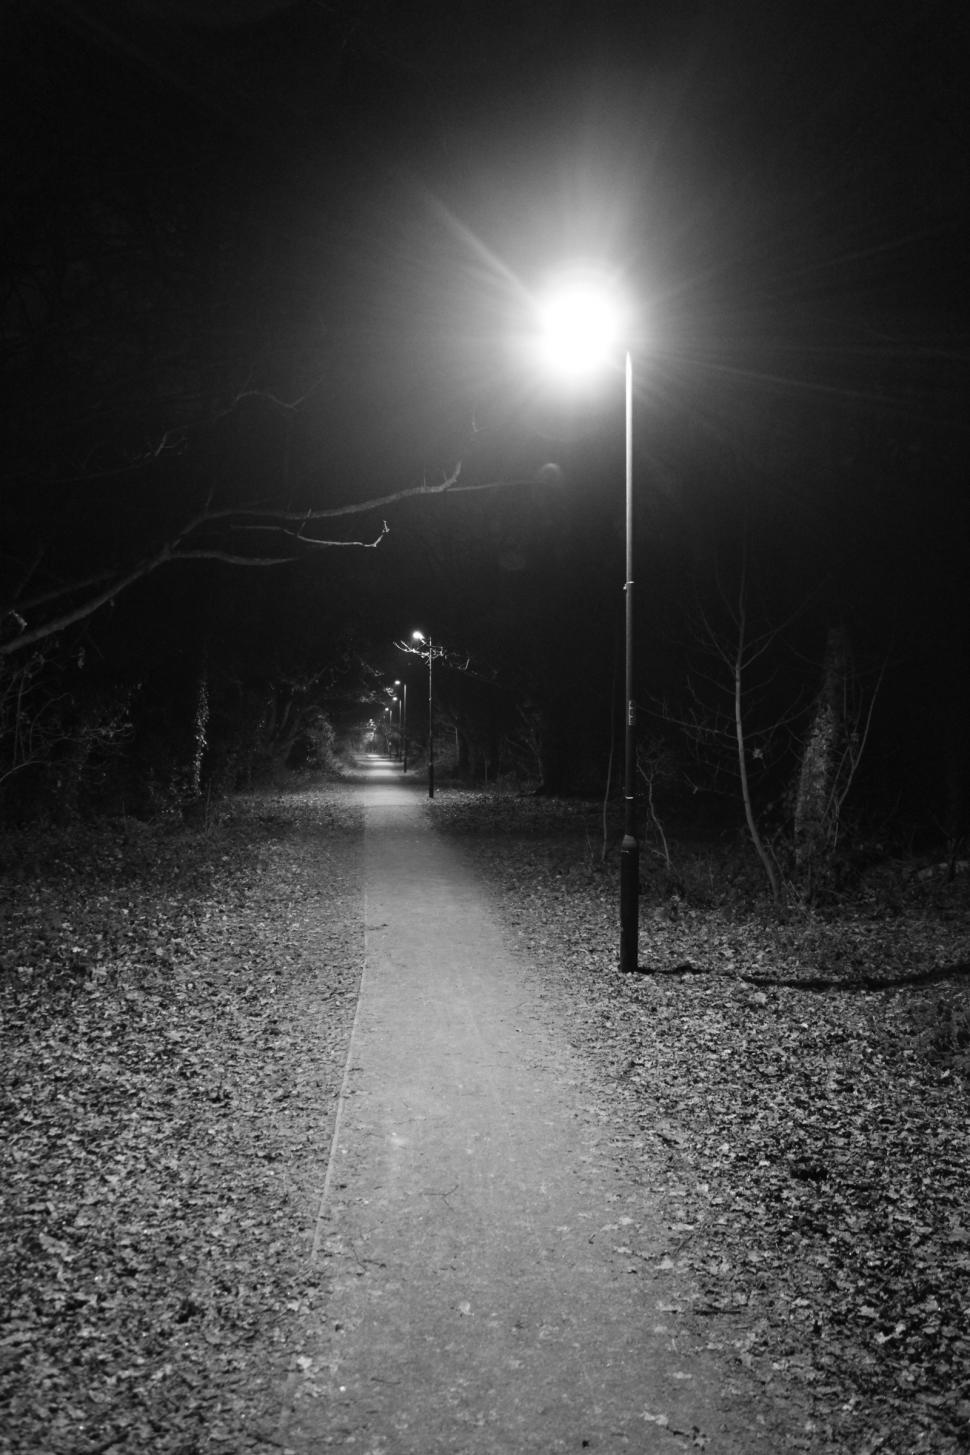 Download Free Stock Photo of Dark abandoned pathway